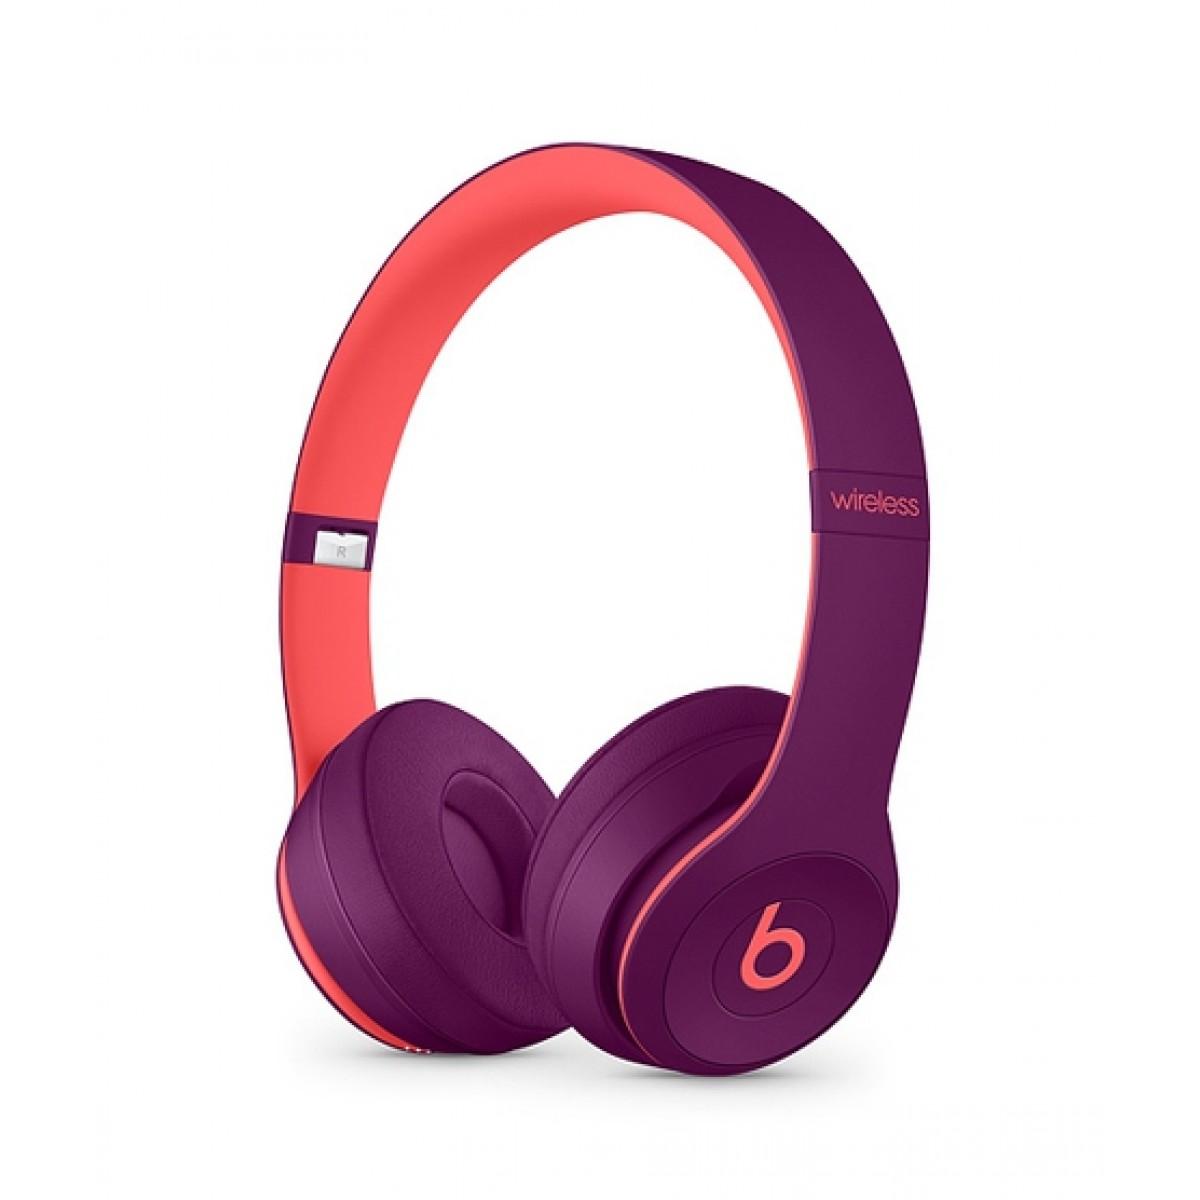 Beats Solo 3 Wireless On Ear Headphones Price In Pakistan Buy Beats Bluetooth Headphones Pop Magenta Ishopping Pk